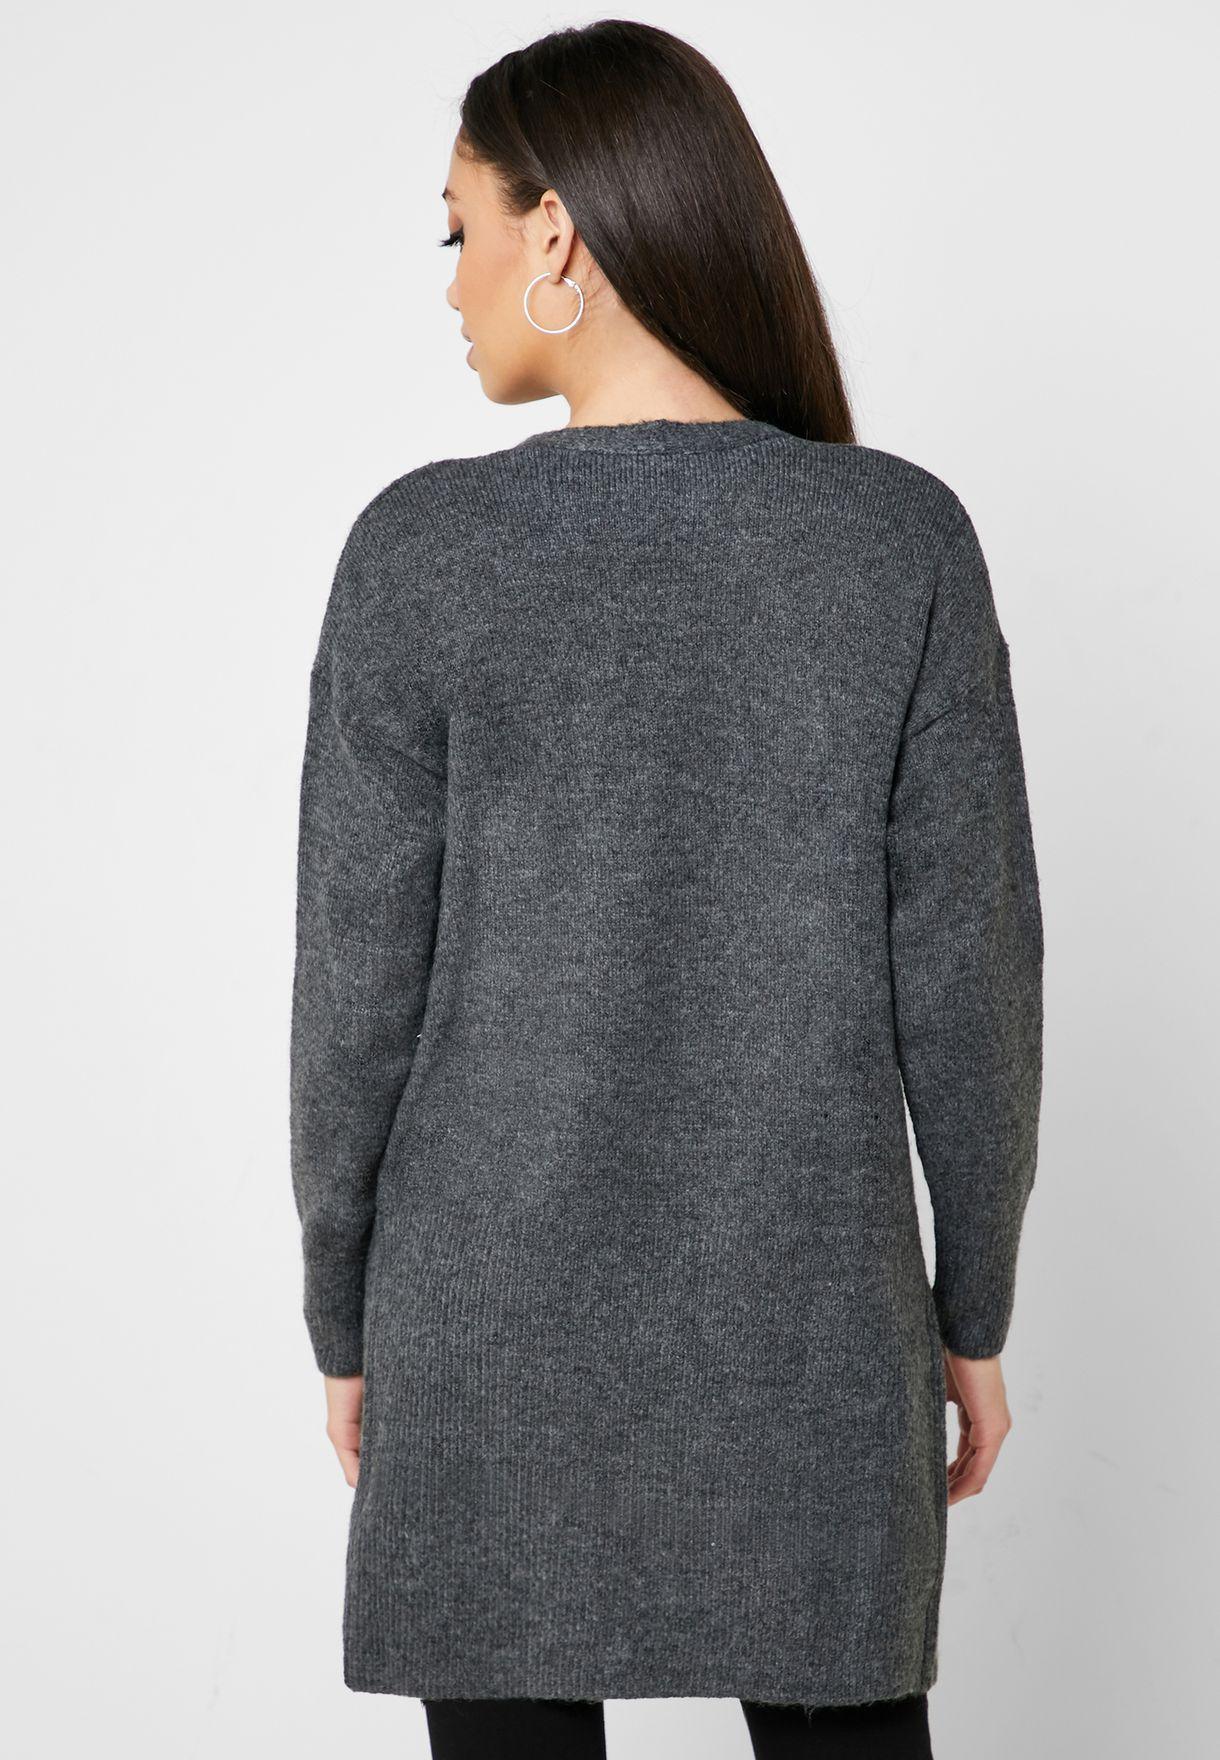 Pocket Detail Longline Cardigan